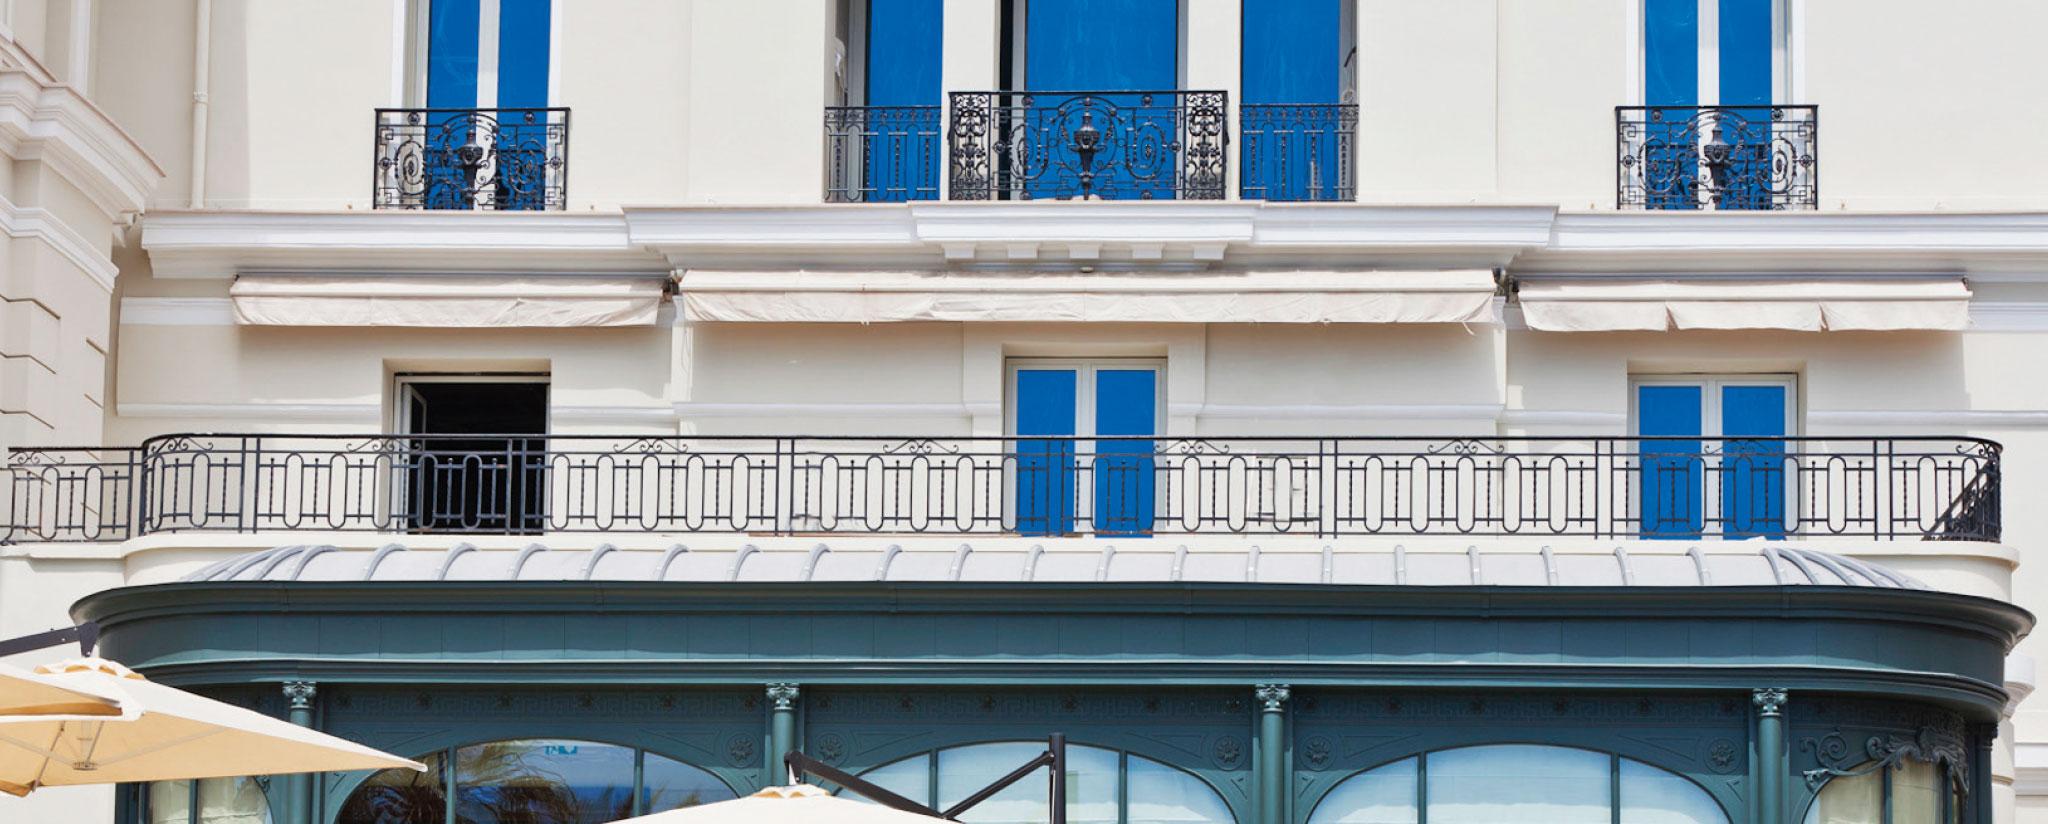 gonzato-hotel-paris-3